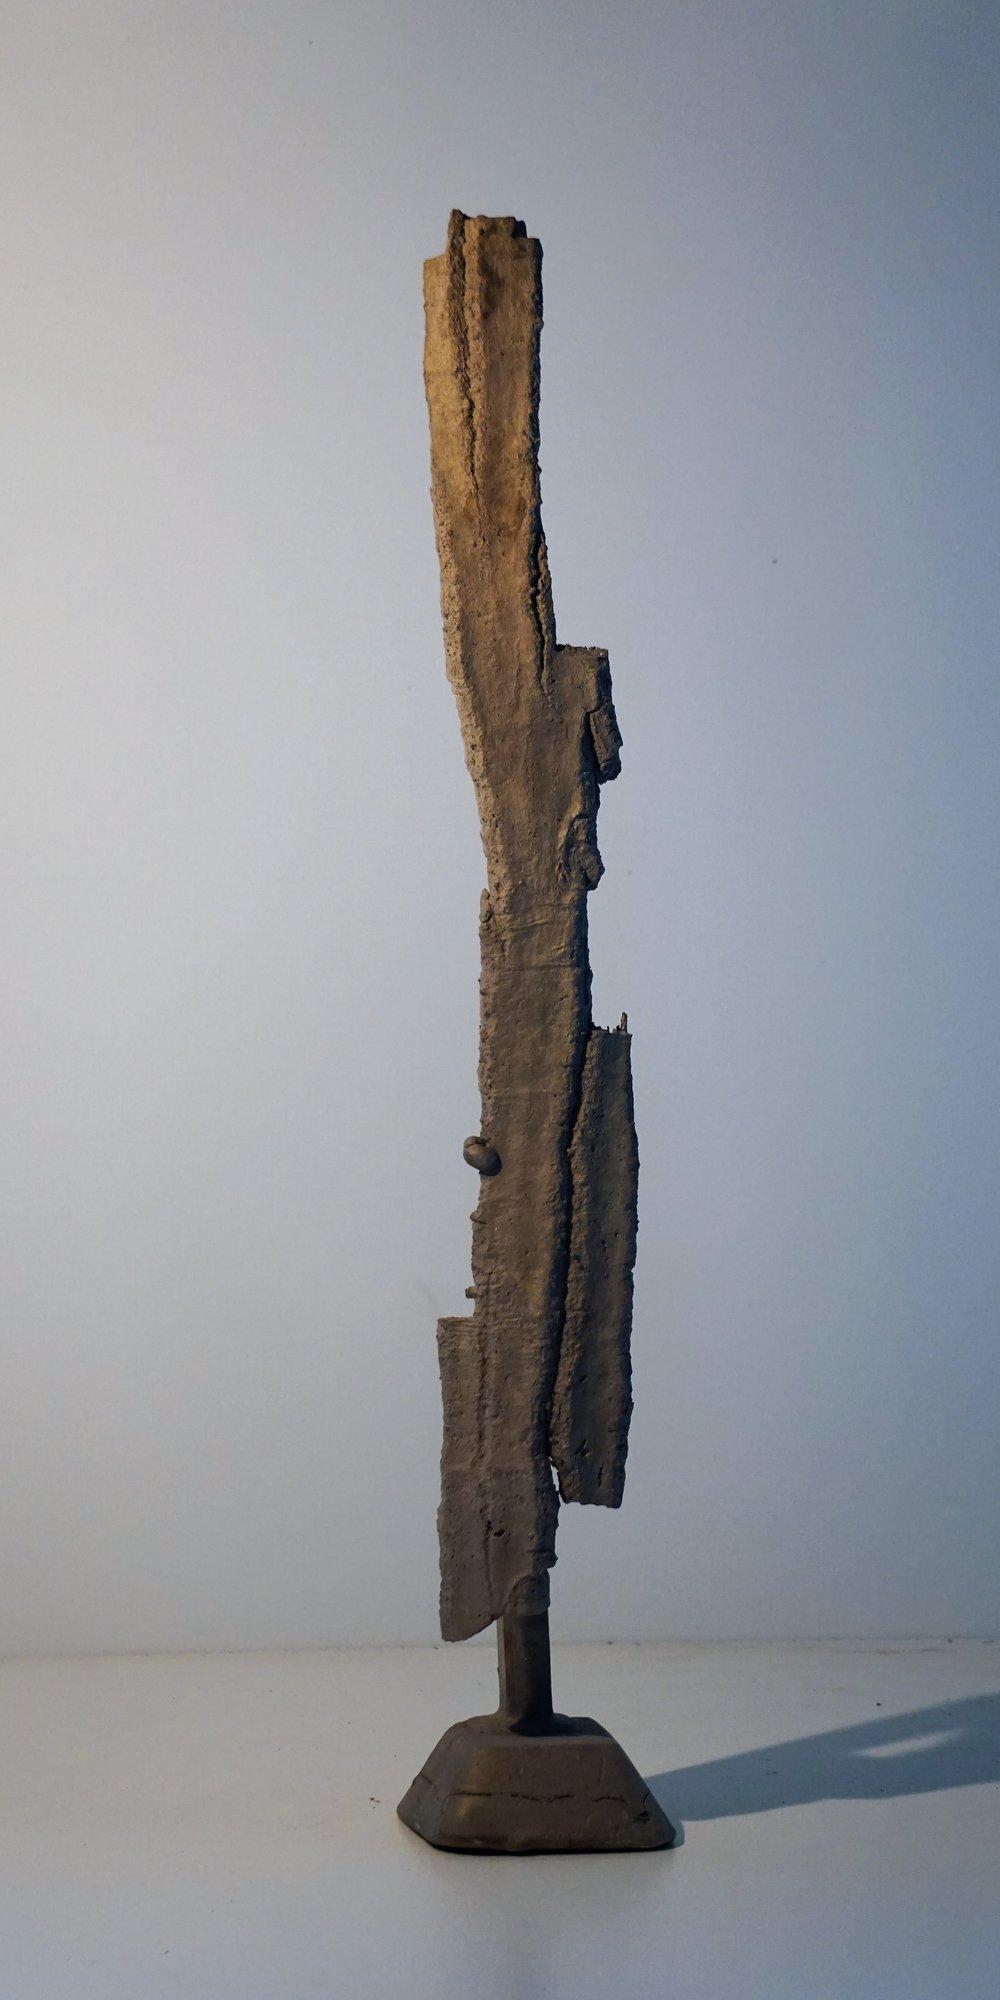 Bark #18